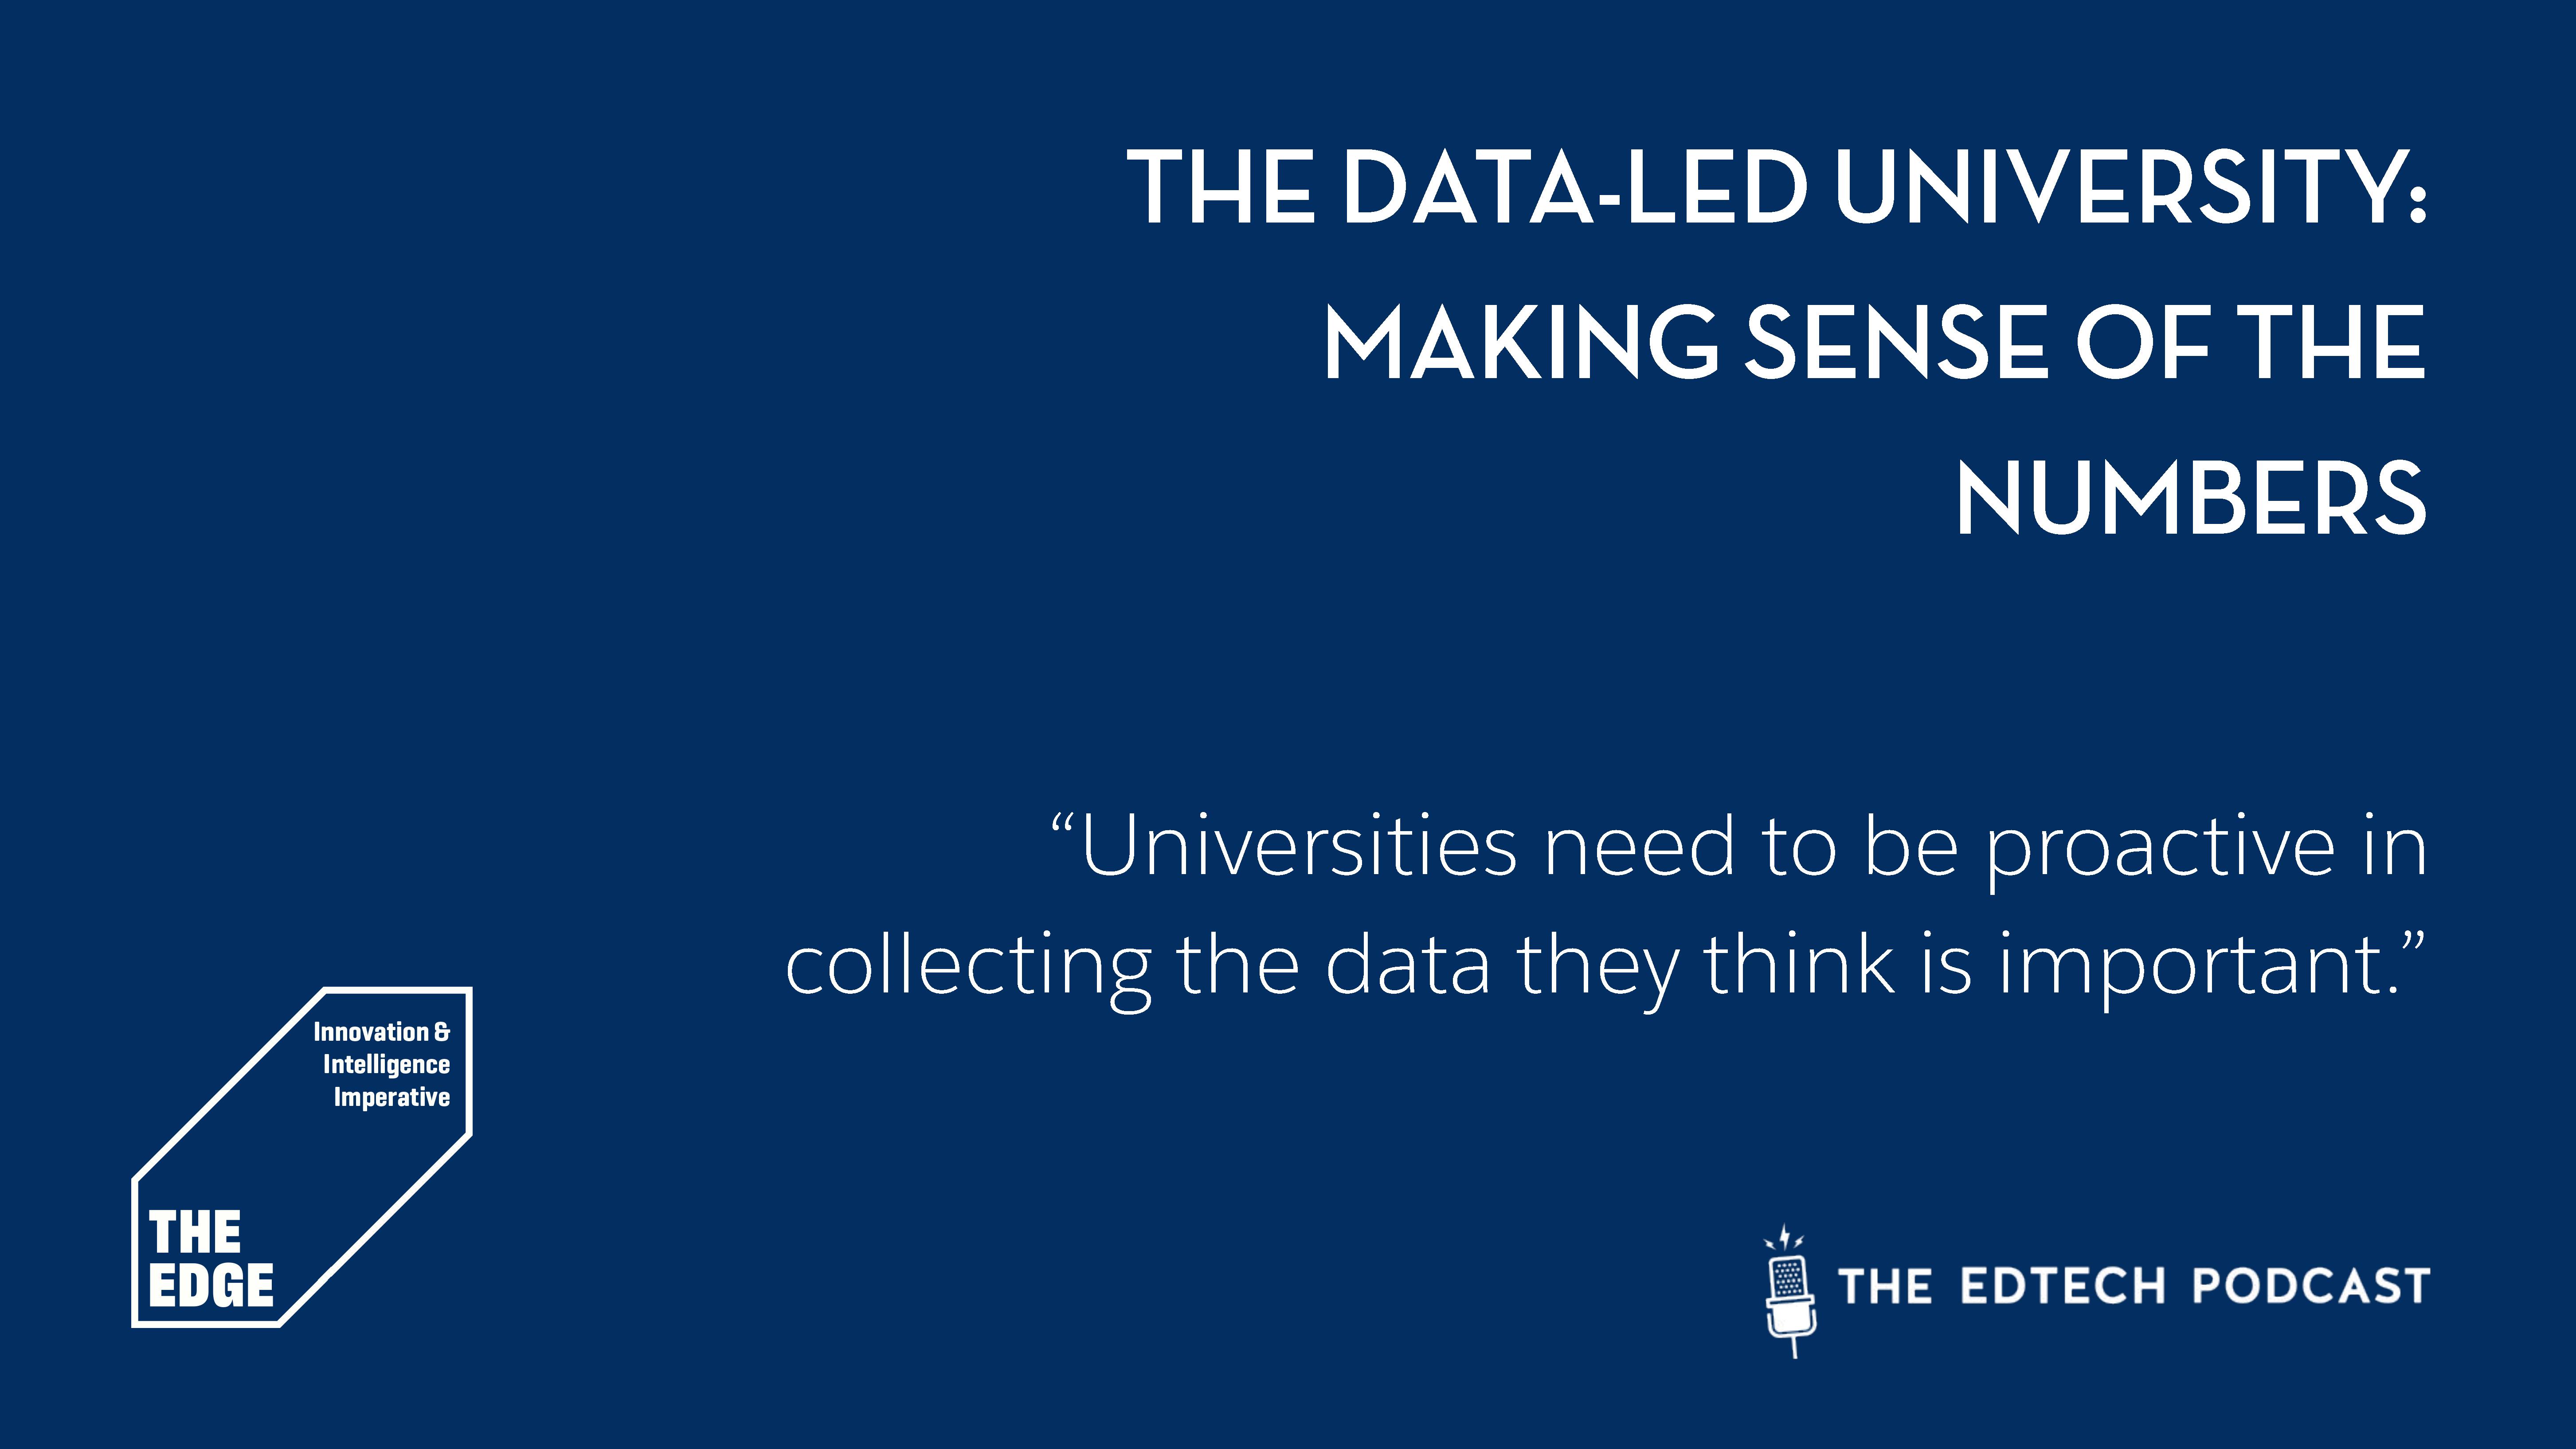 Epidsode 3 | The Data-led University: Making Sense Of The Numbers